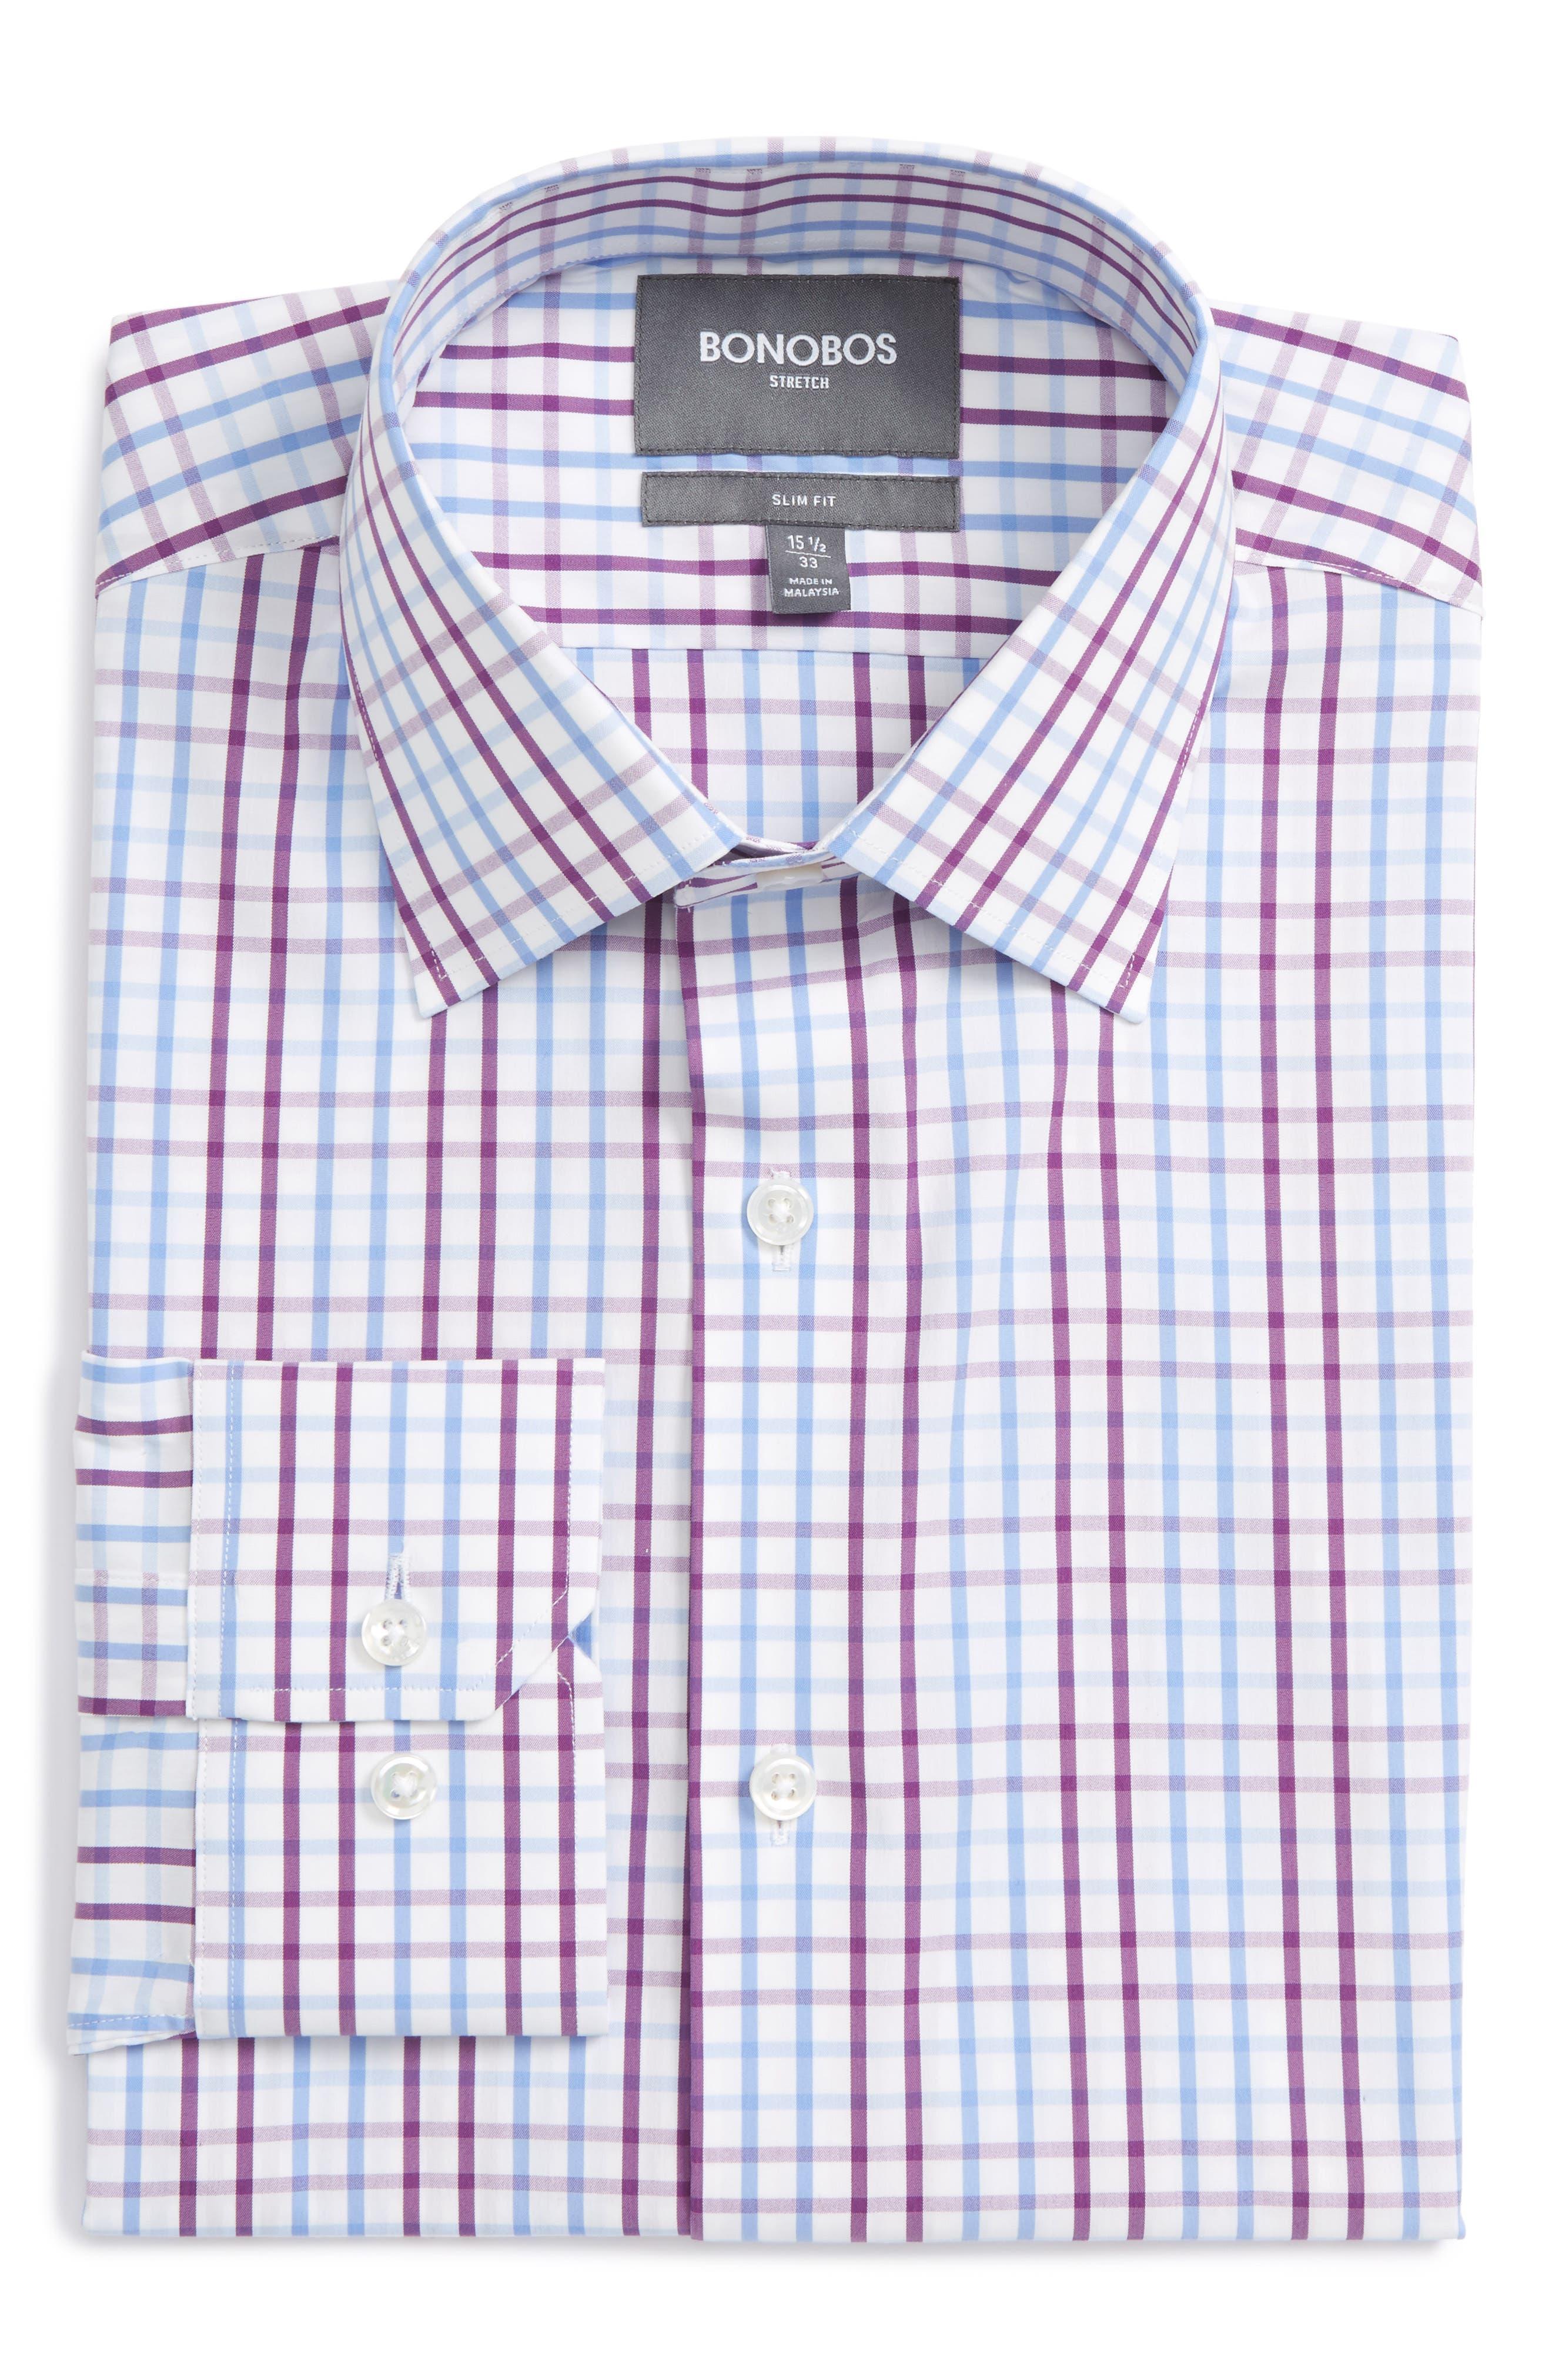 BONOBOS Jetsetter Slim Fit Check Dress Shirt